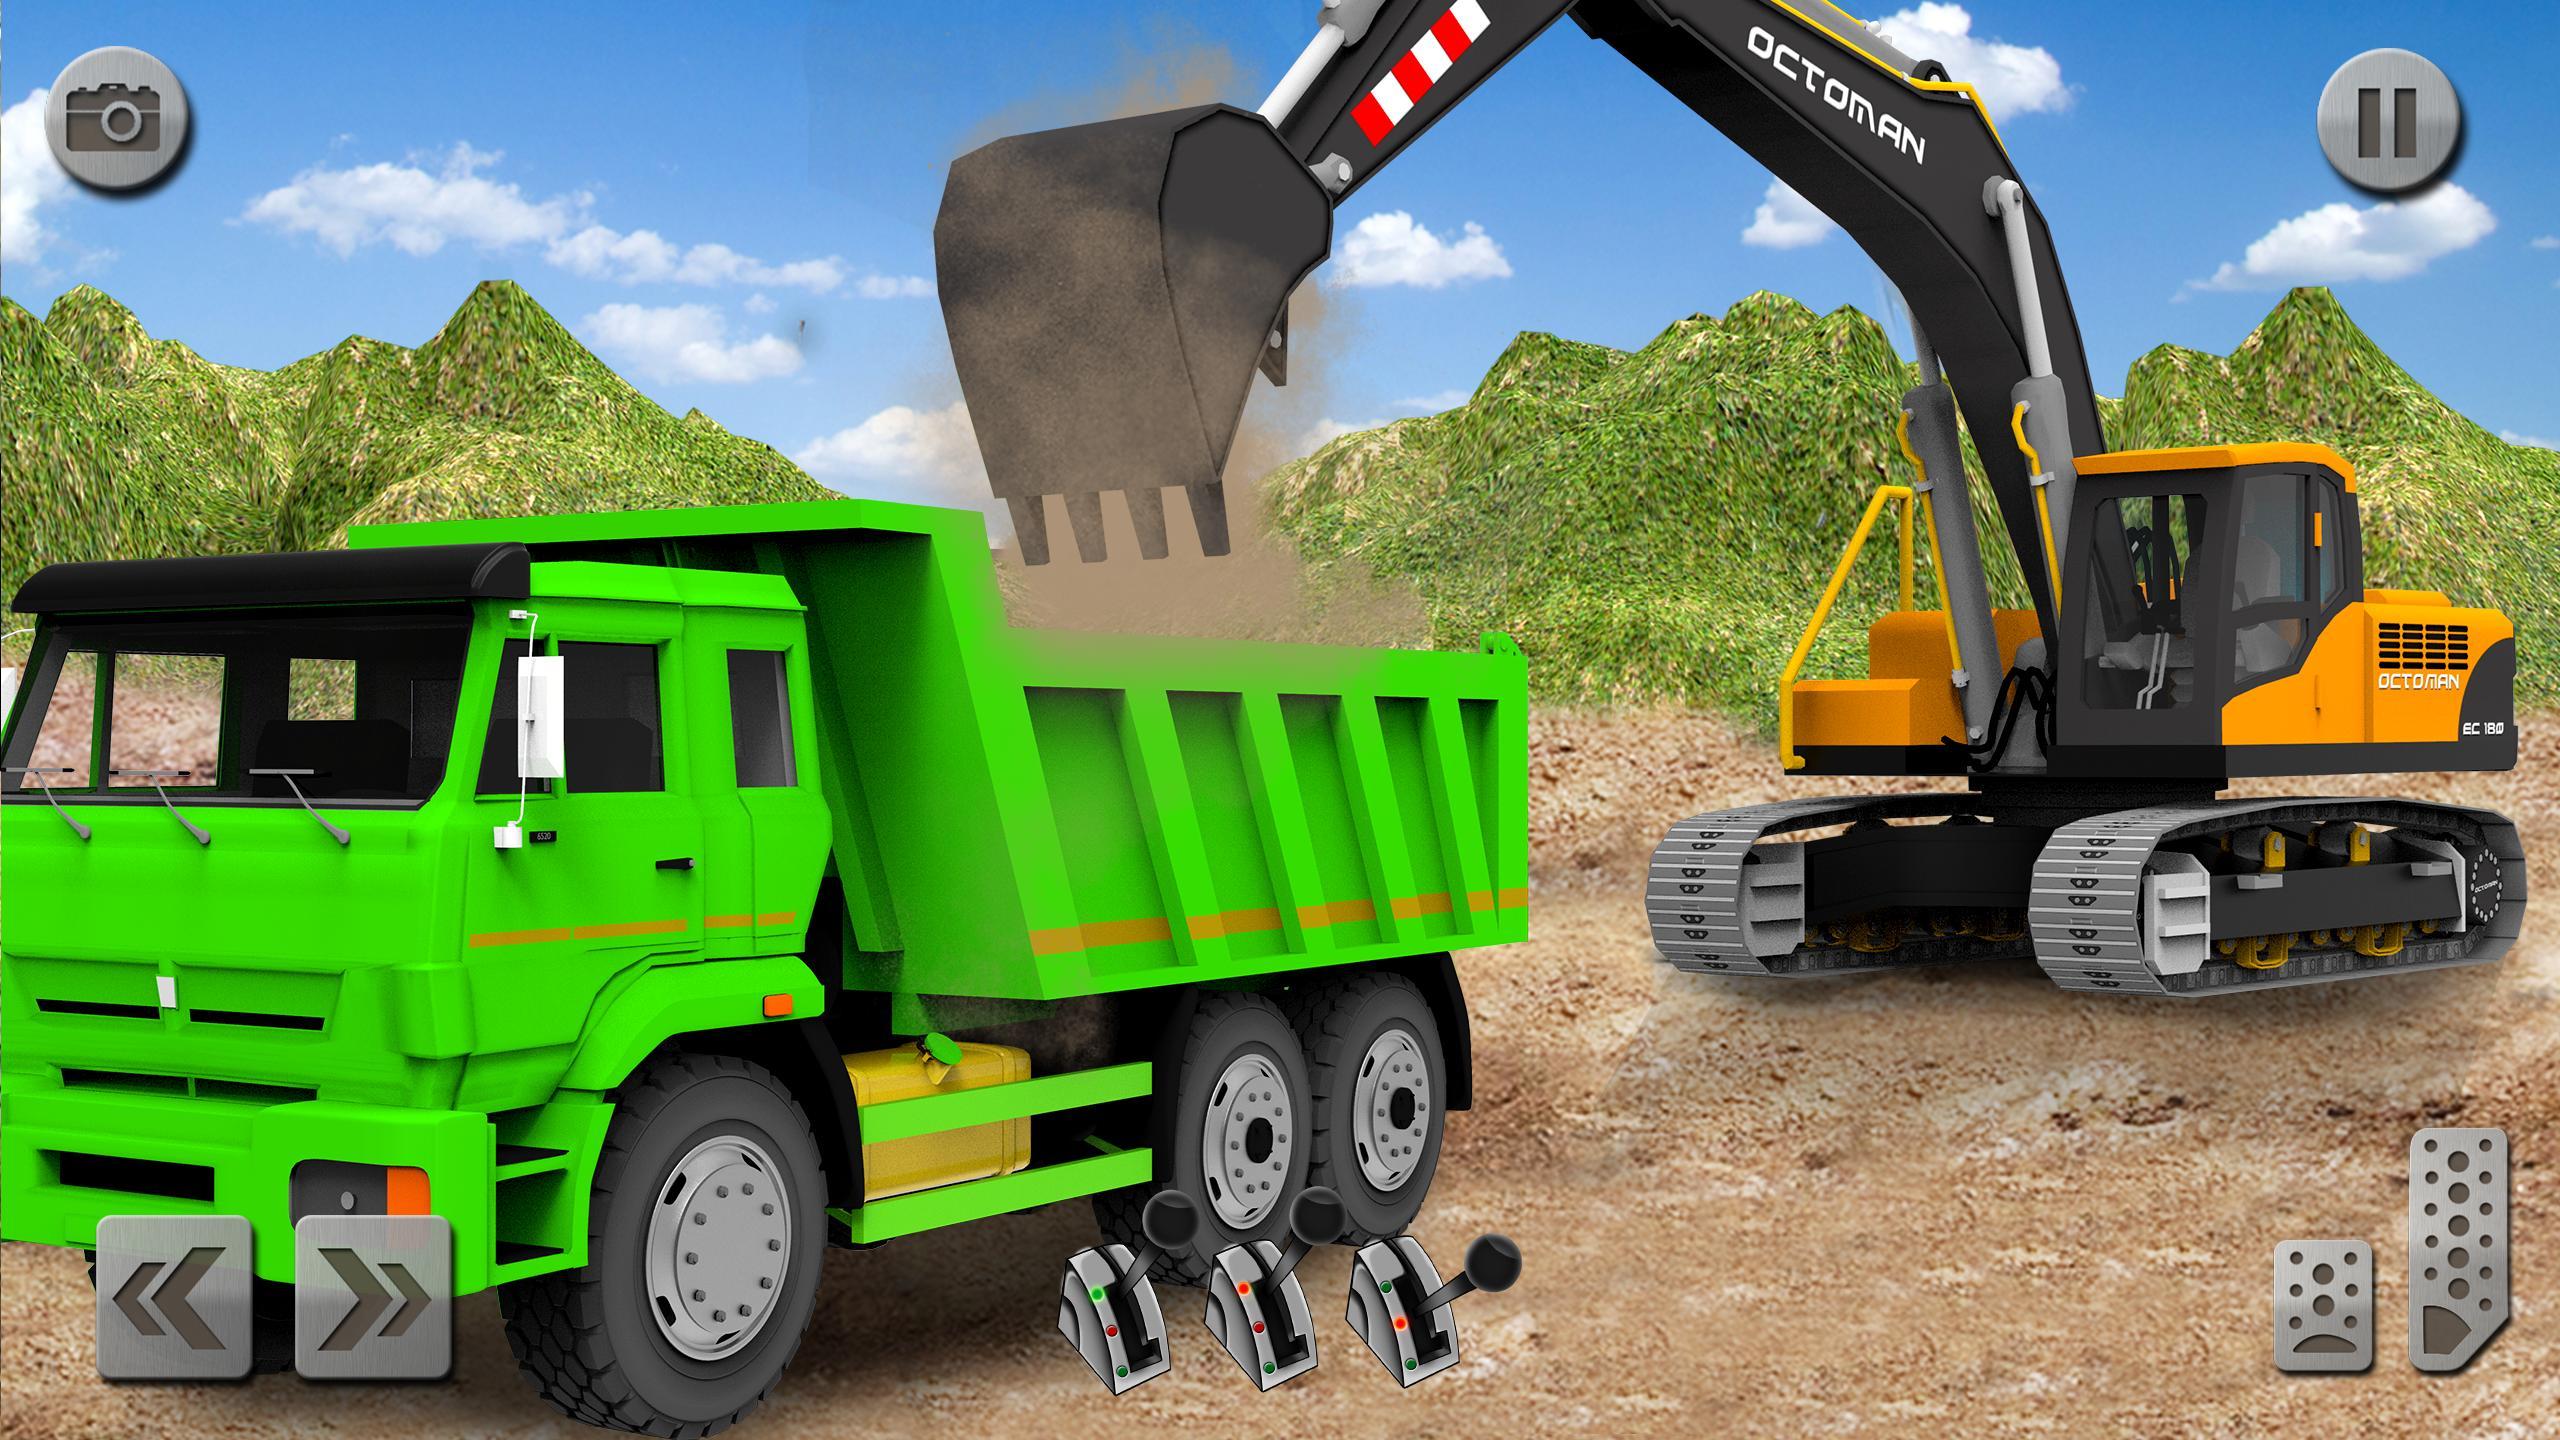 Sand Excavator Truck Driving Rescue Simulator game 5.2 Screenshot 17